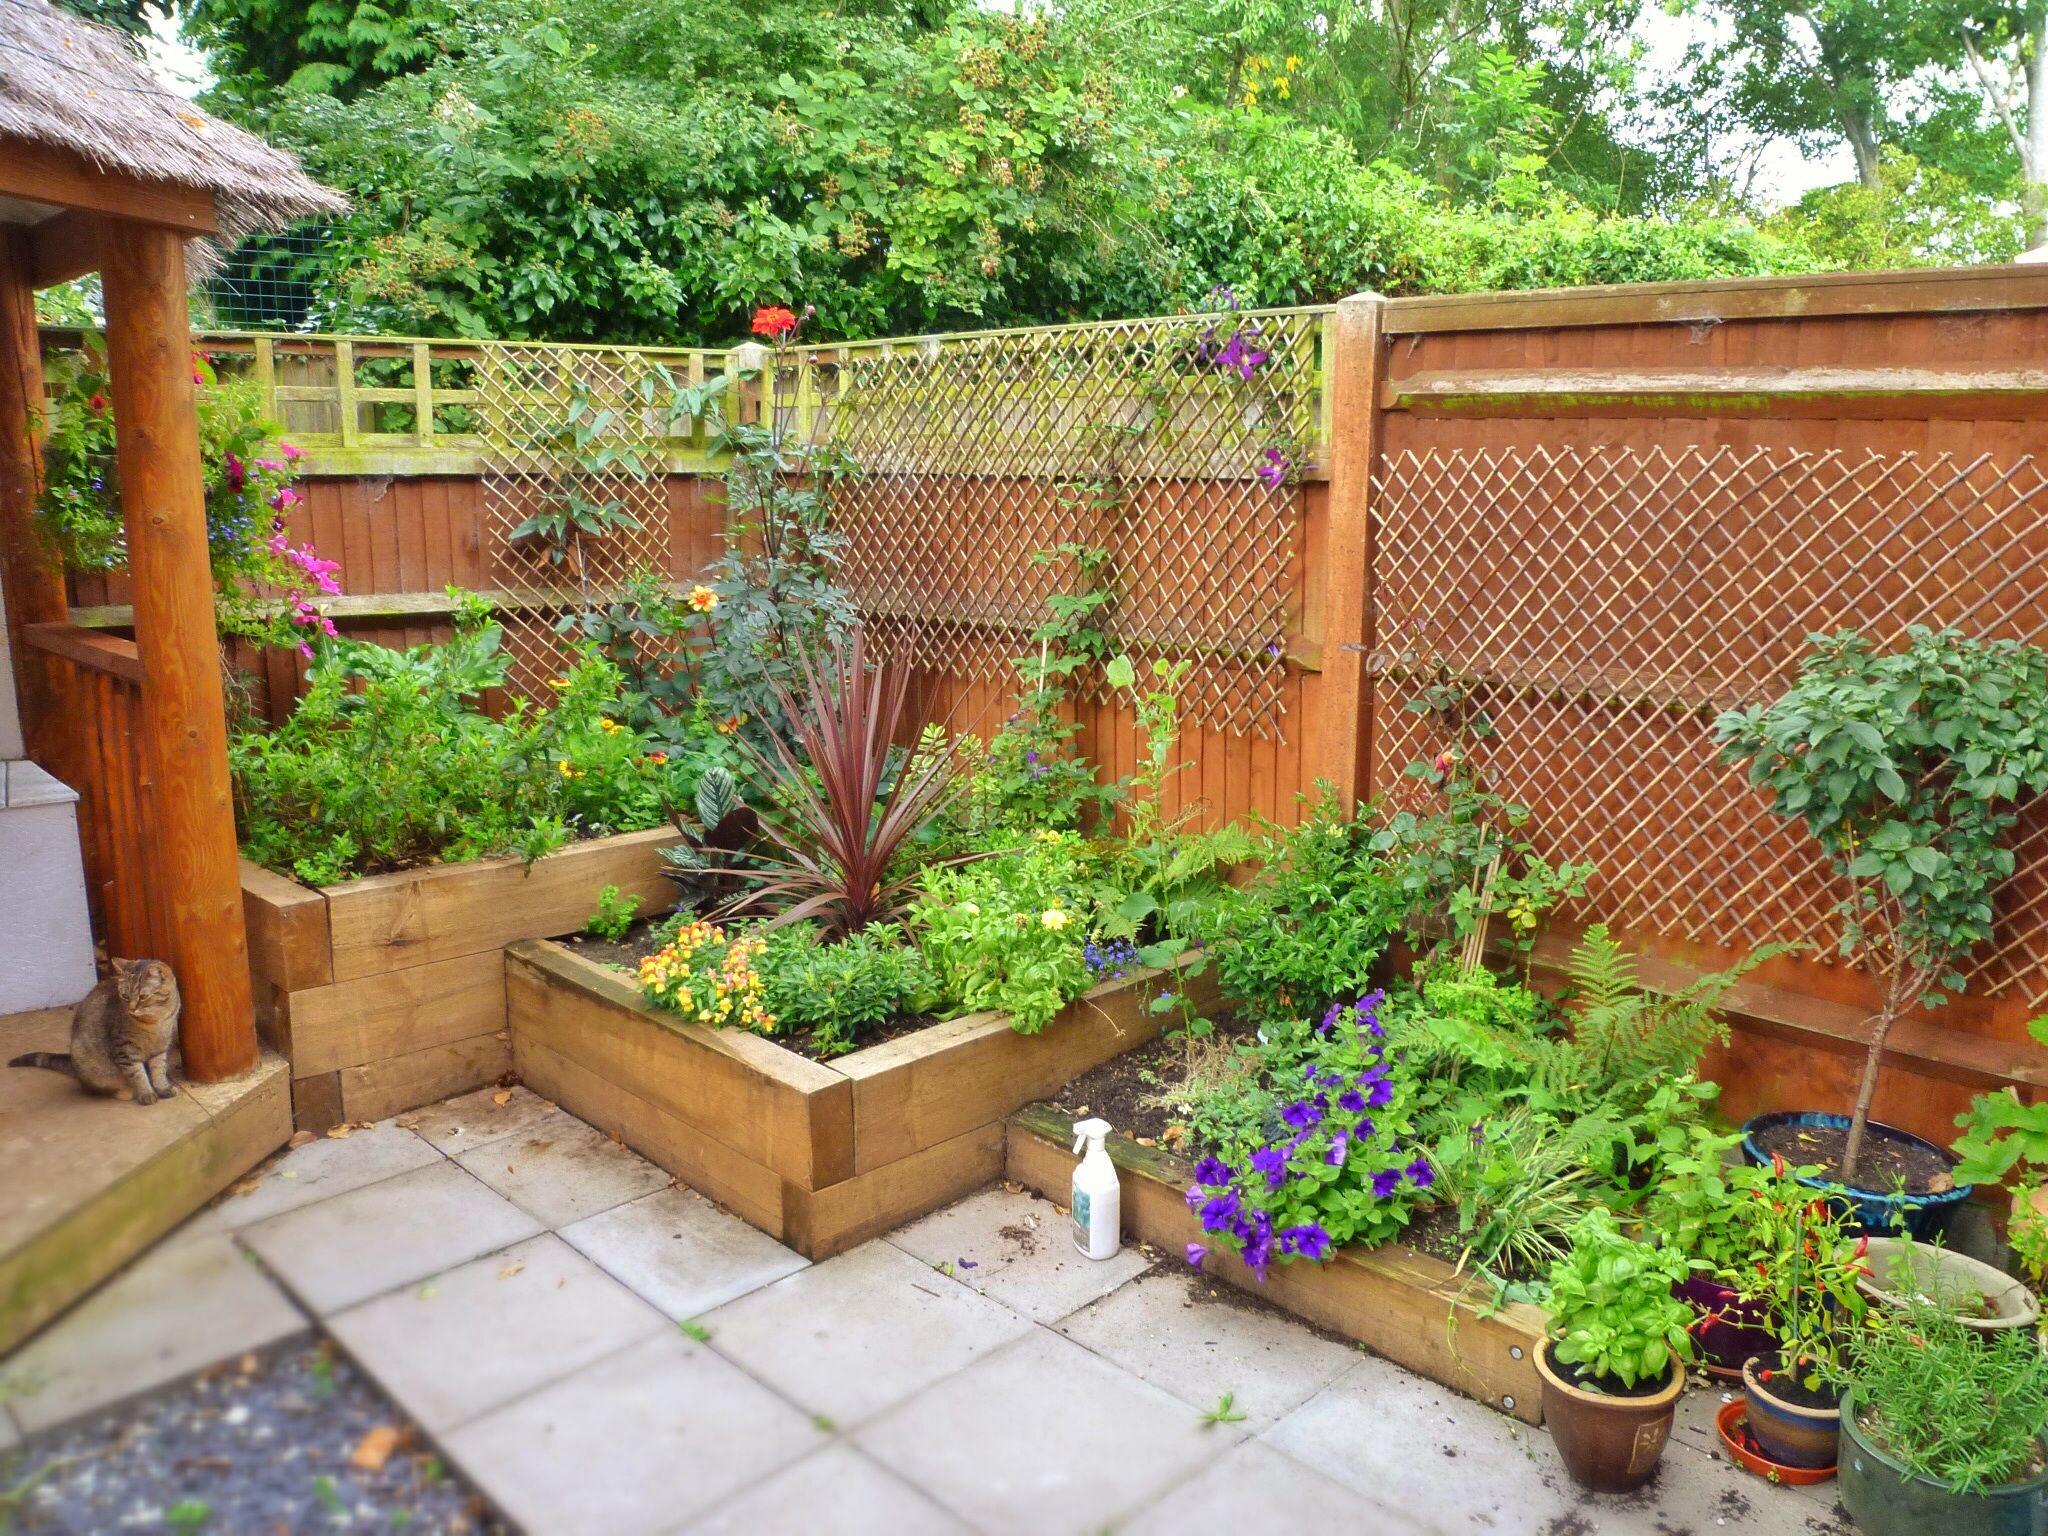 raised flower bed designs - Google Search   Raised flower beds